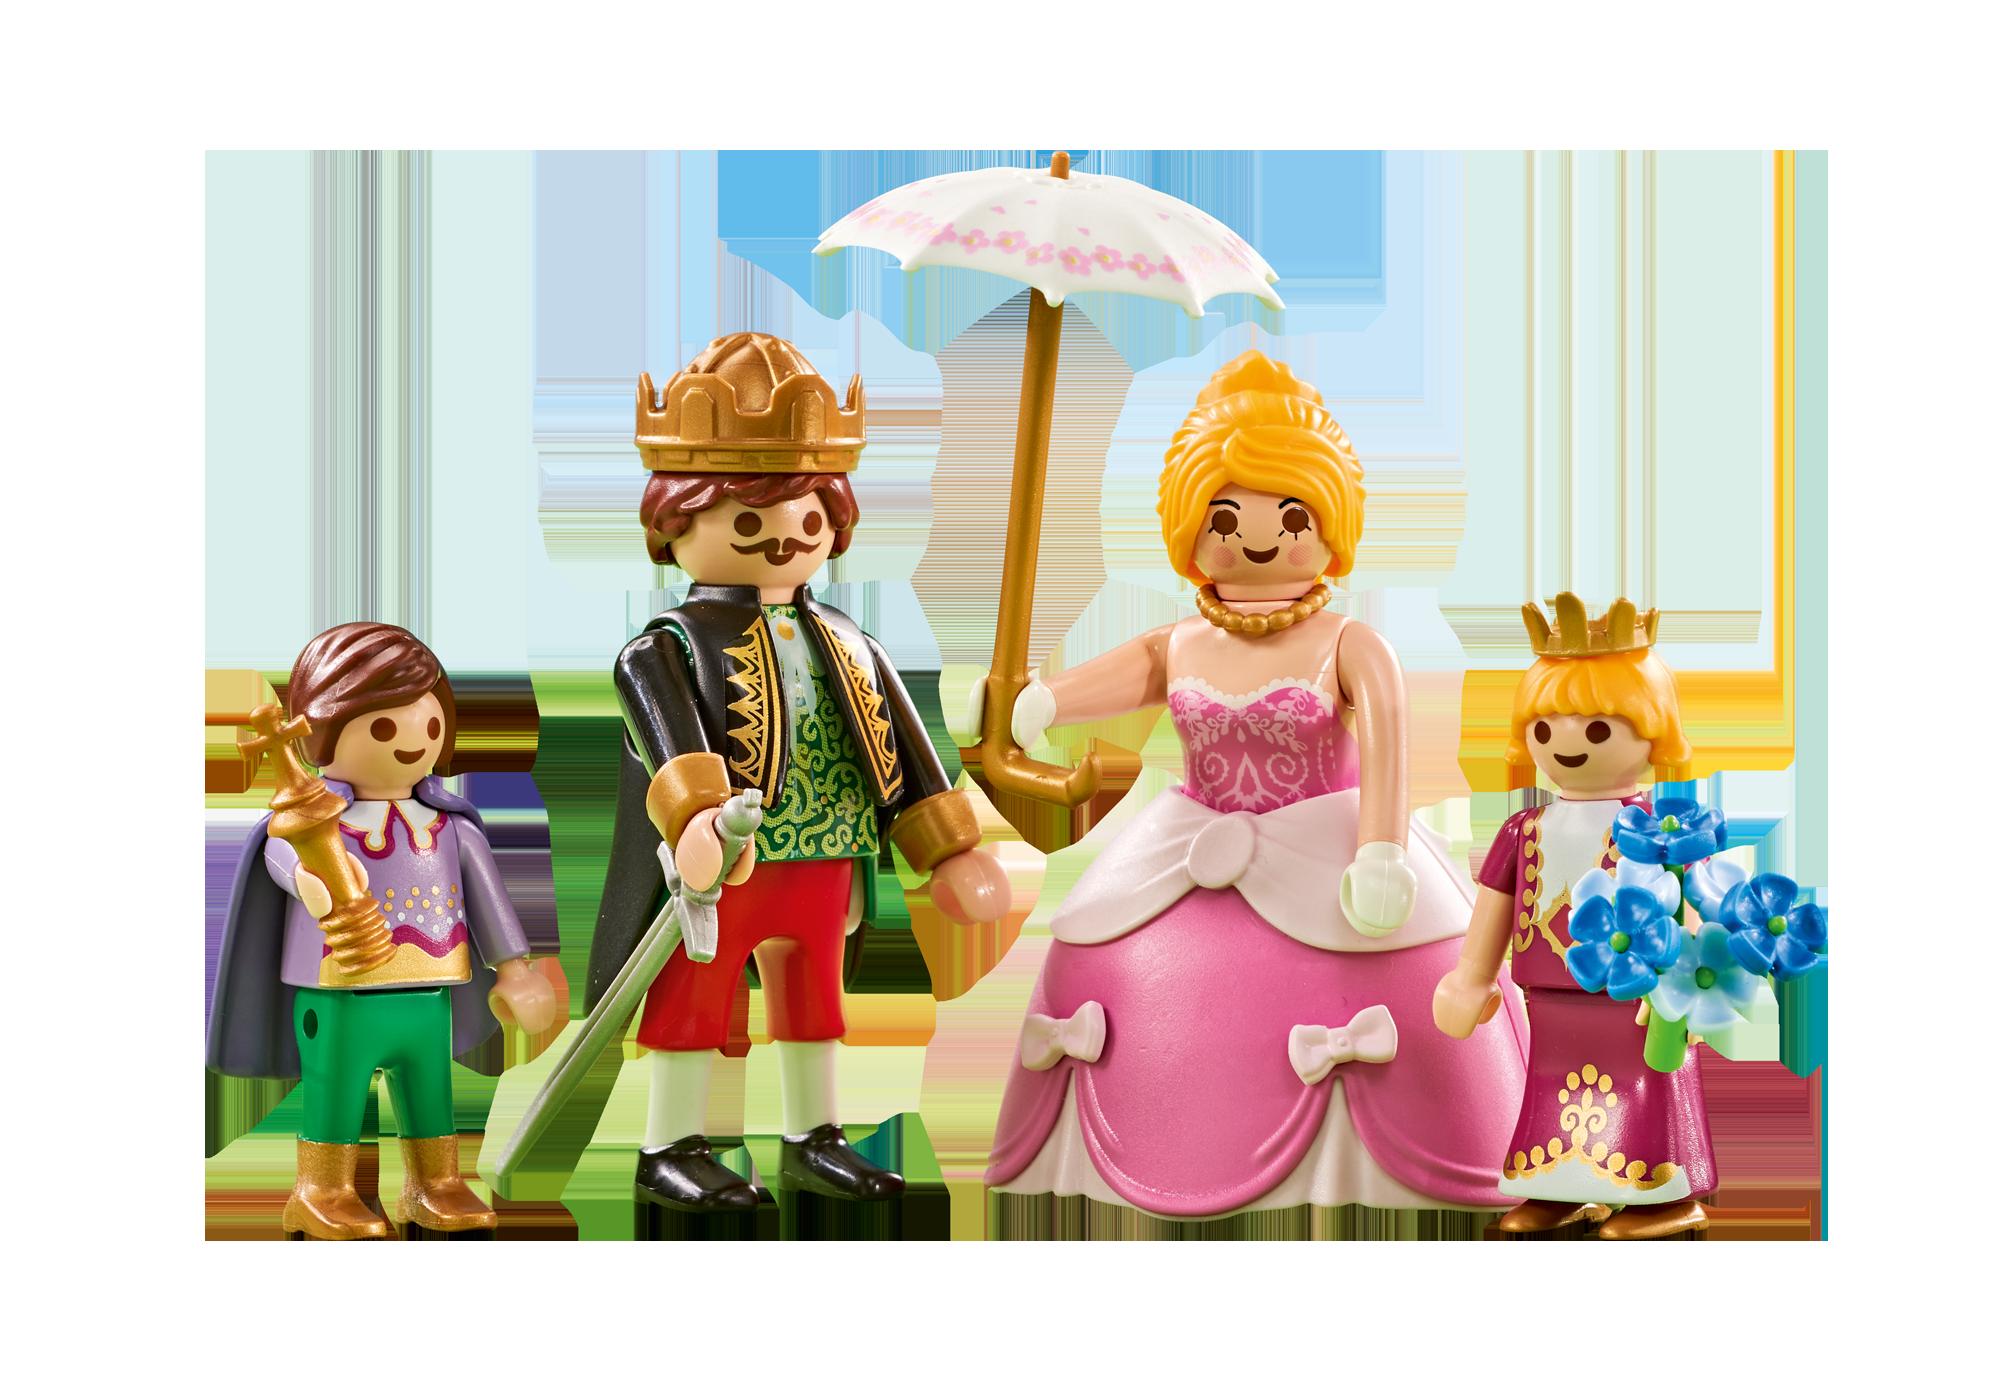 http://media.playmobil.com/i/playmobil/6562_product_detail/Prinzenfamilie